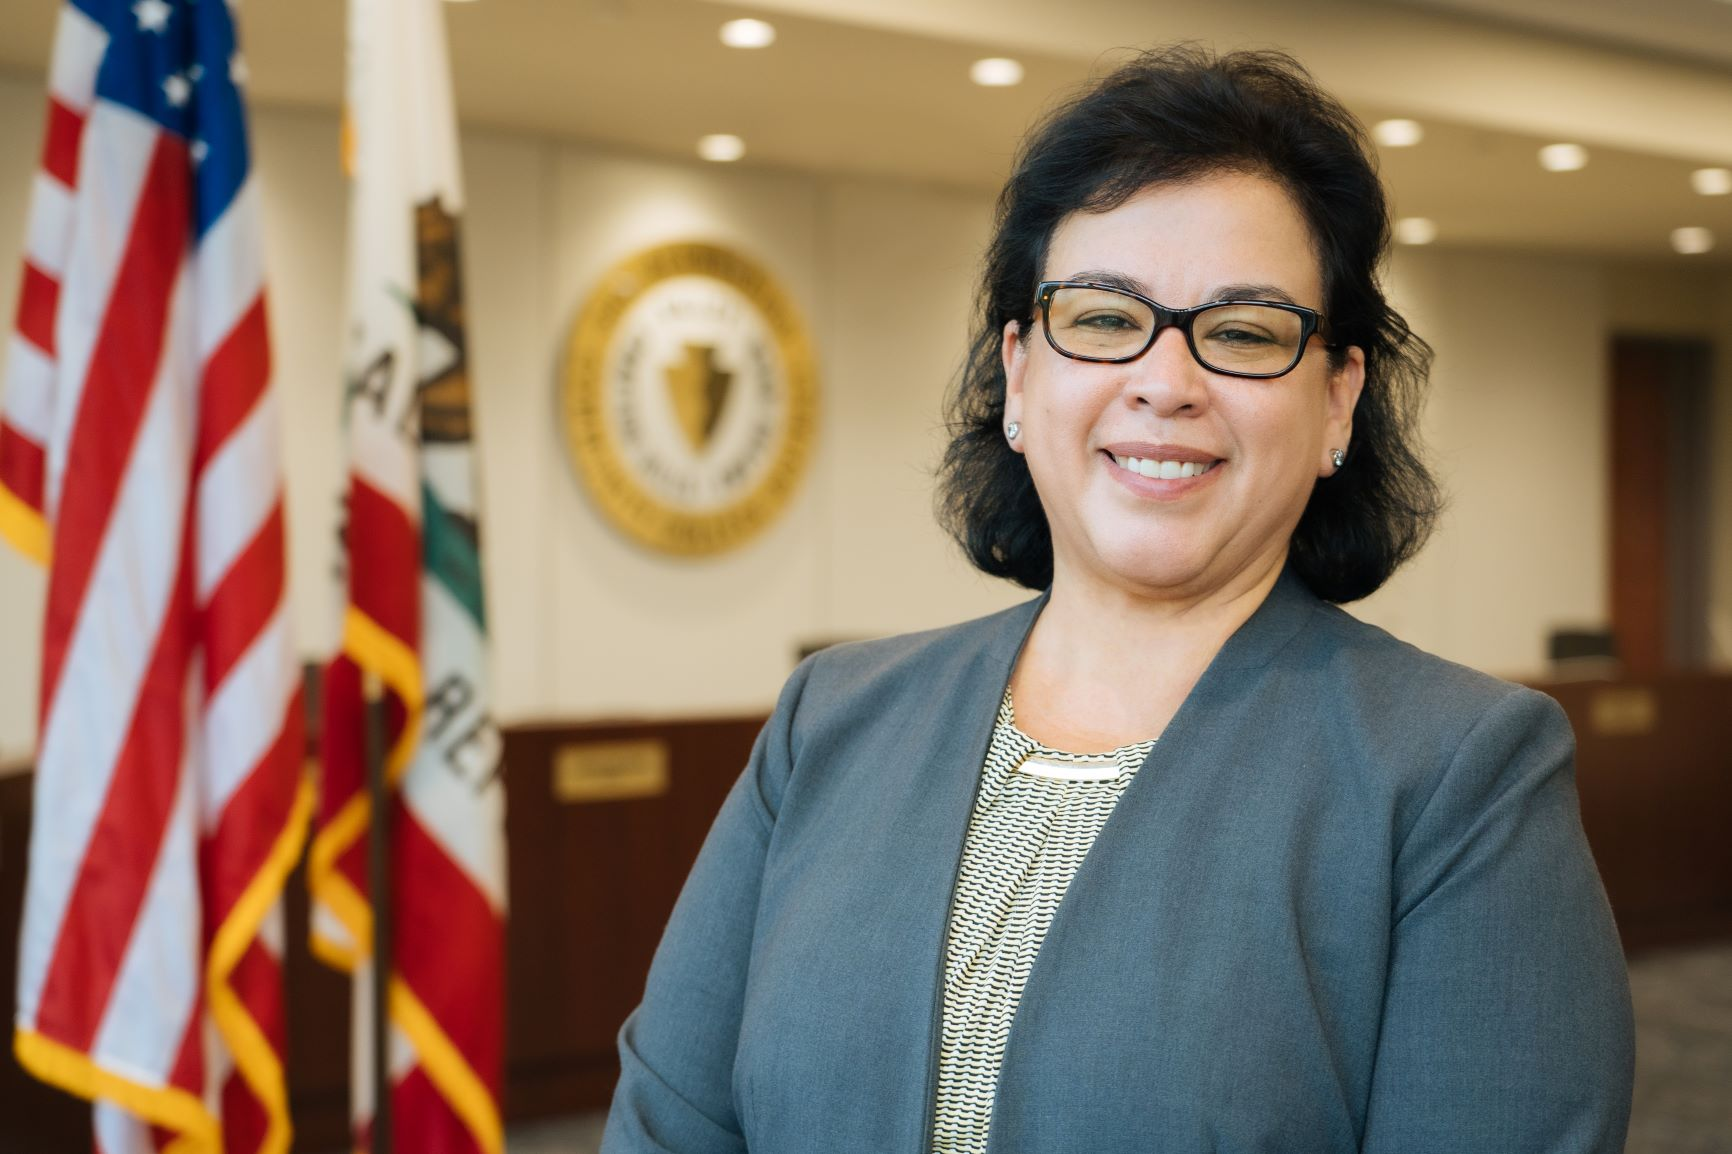 SBCCD Chancellor-Designate Diana Z. Rodriguez